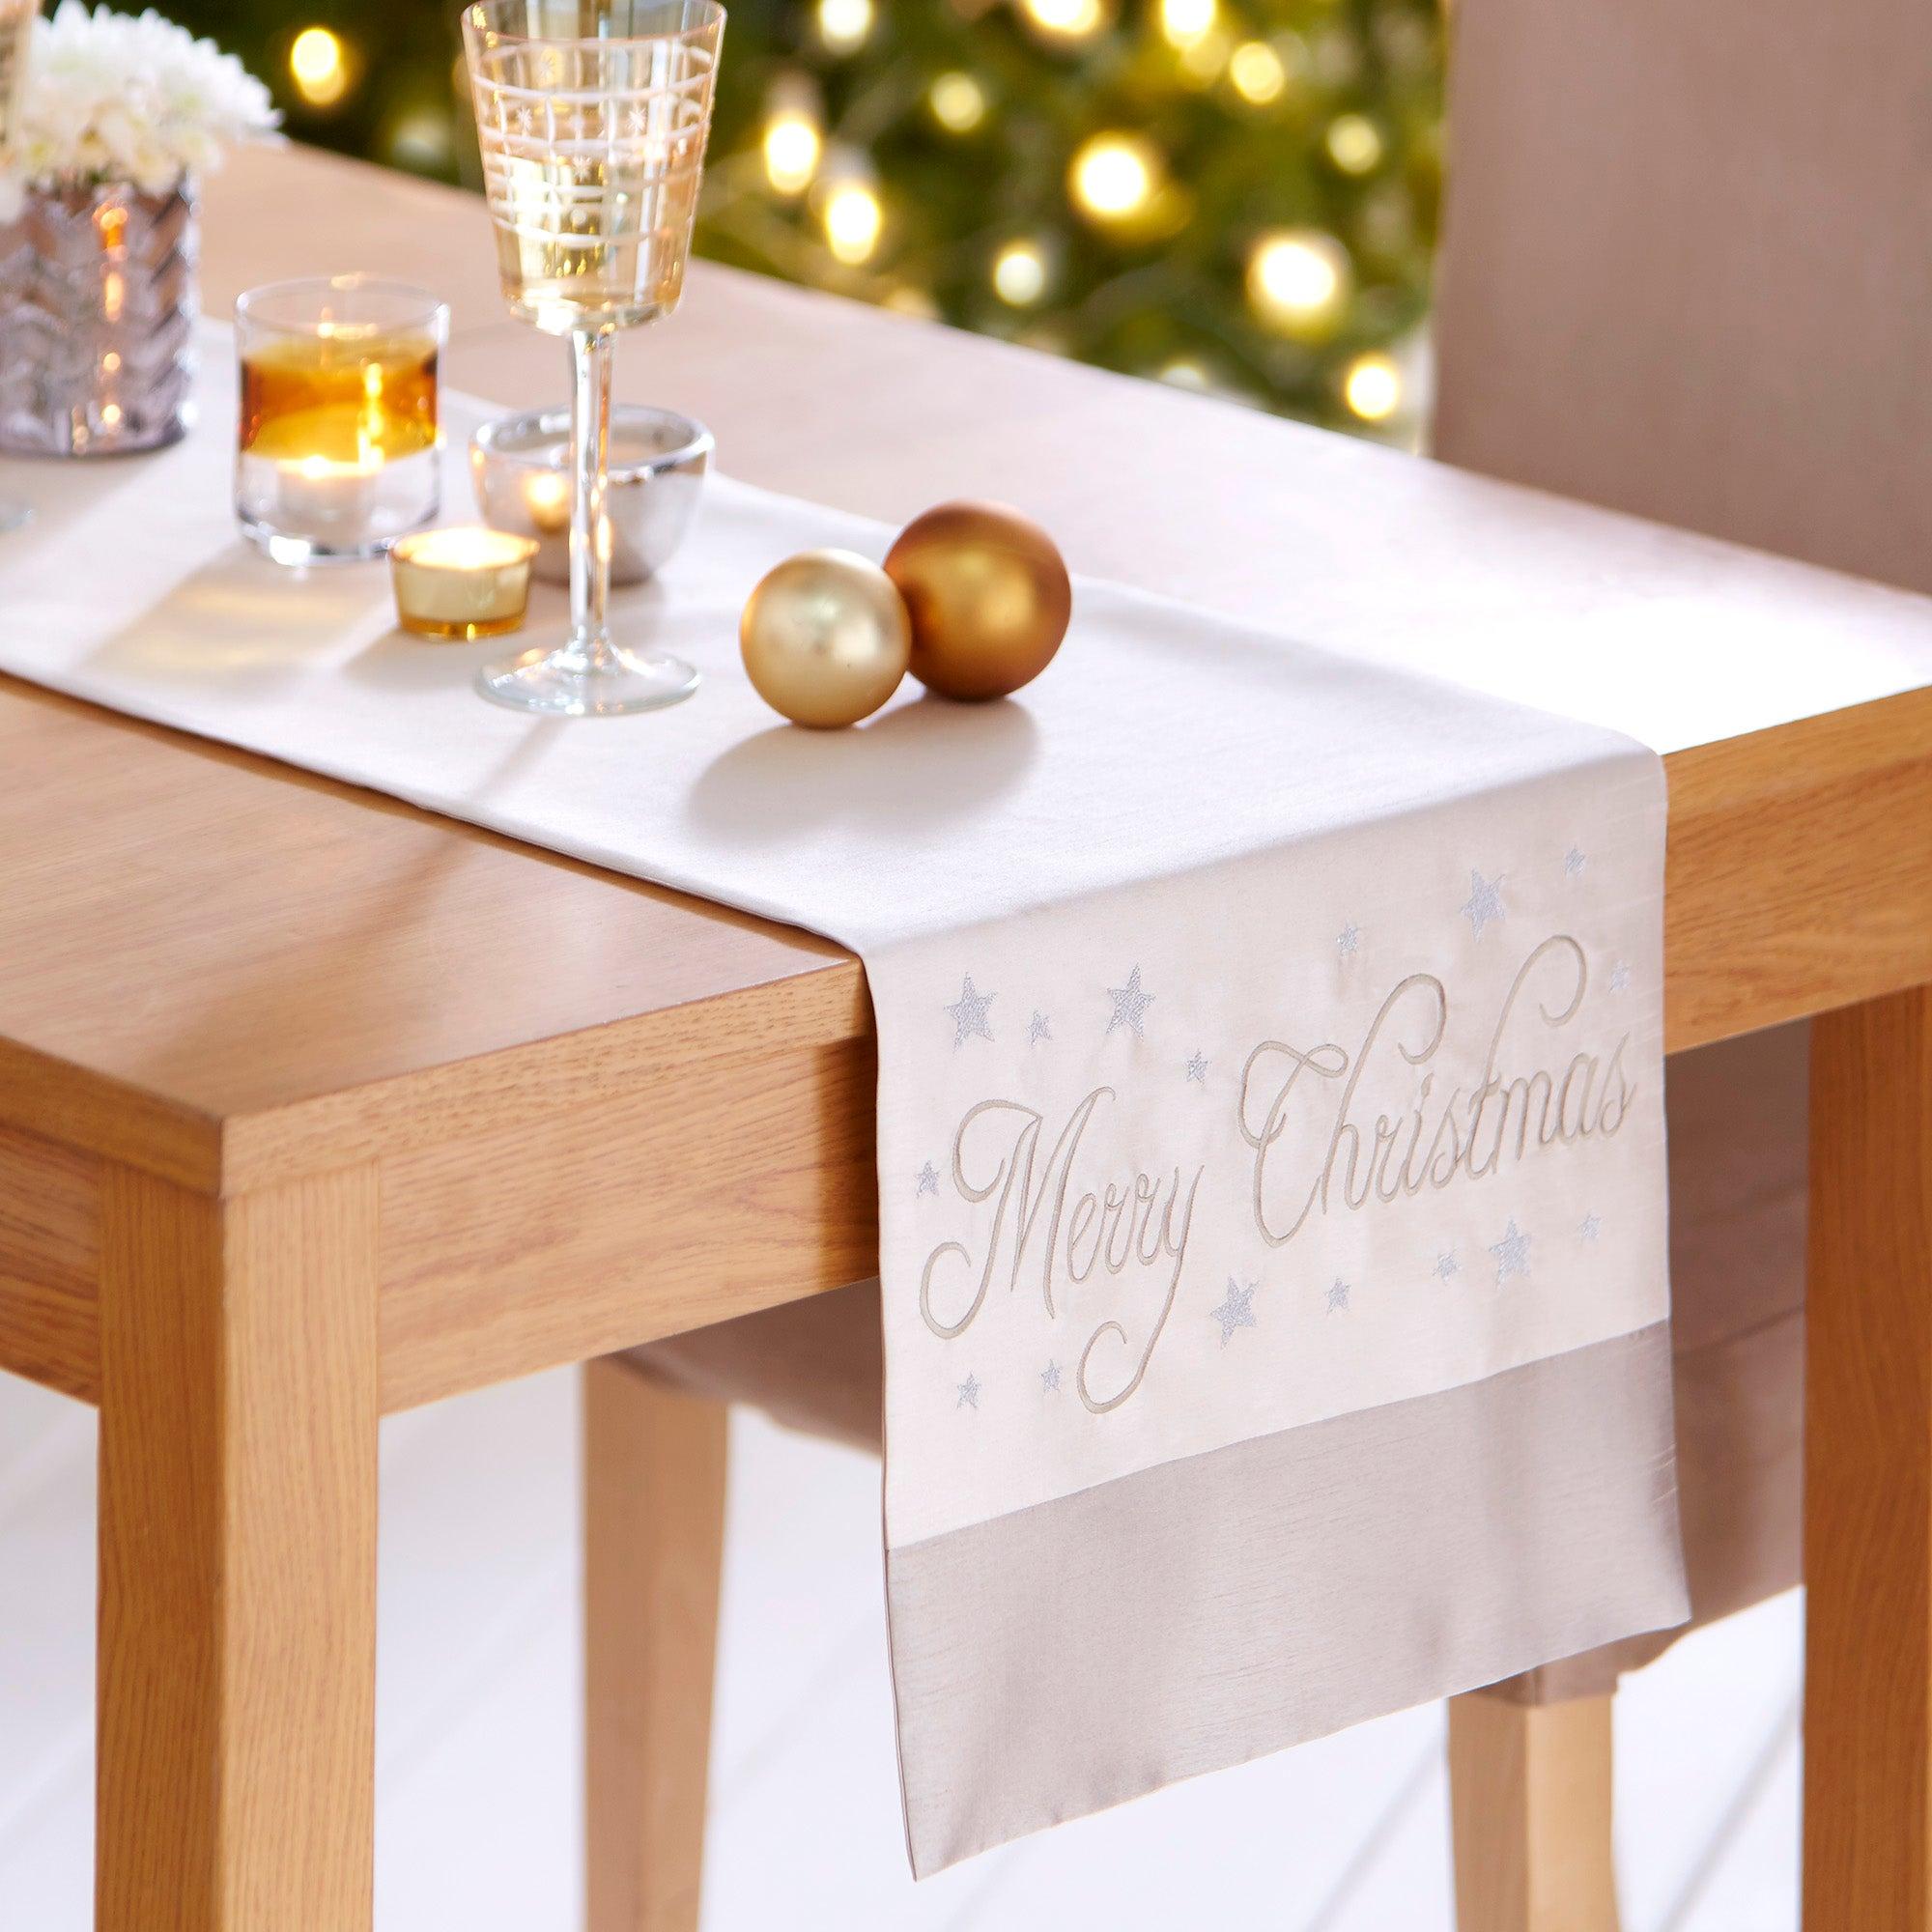 Pearl Merry Christmas Table Runner